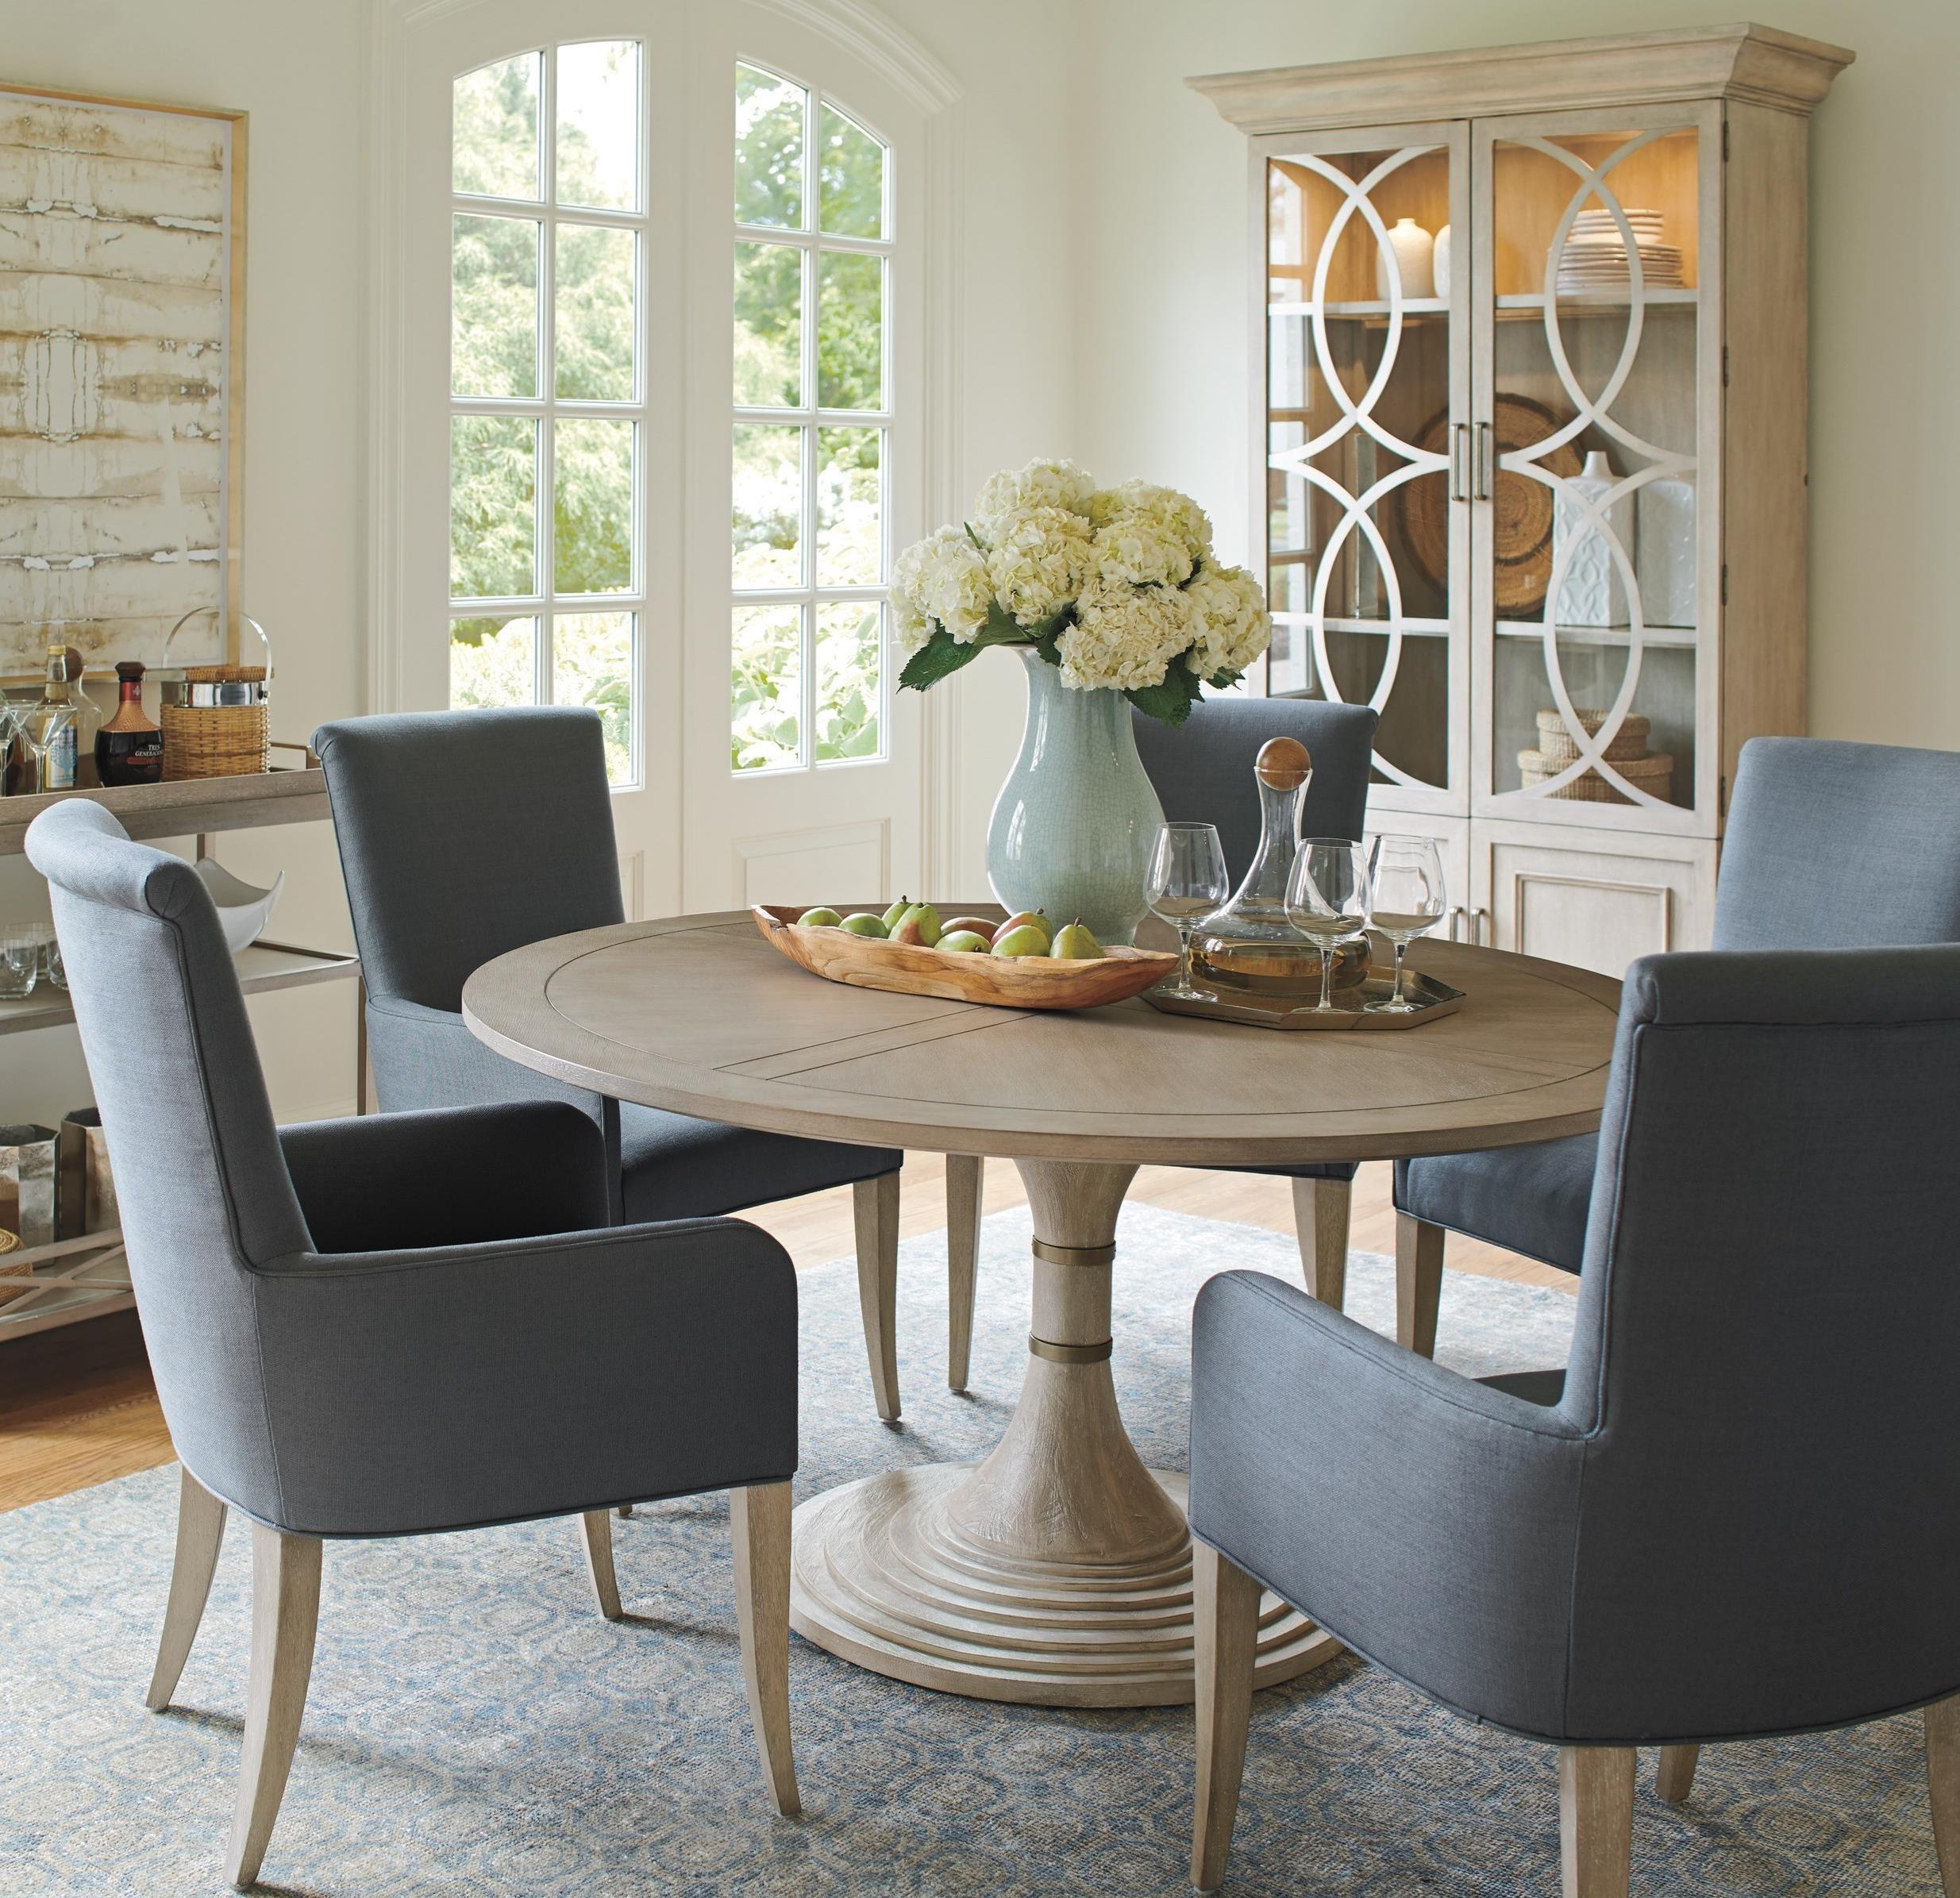 Malibu 6-Piece Dining Set by Barclay Butera at Baer's Furniture